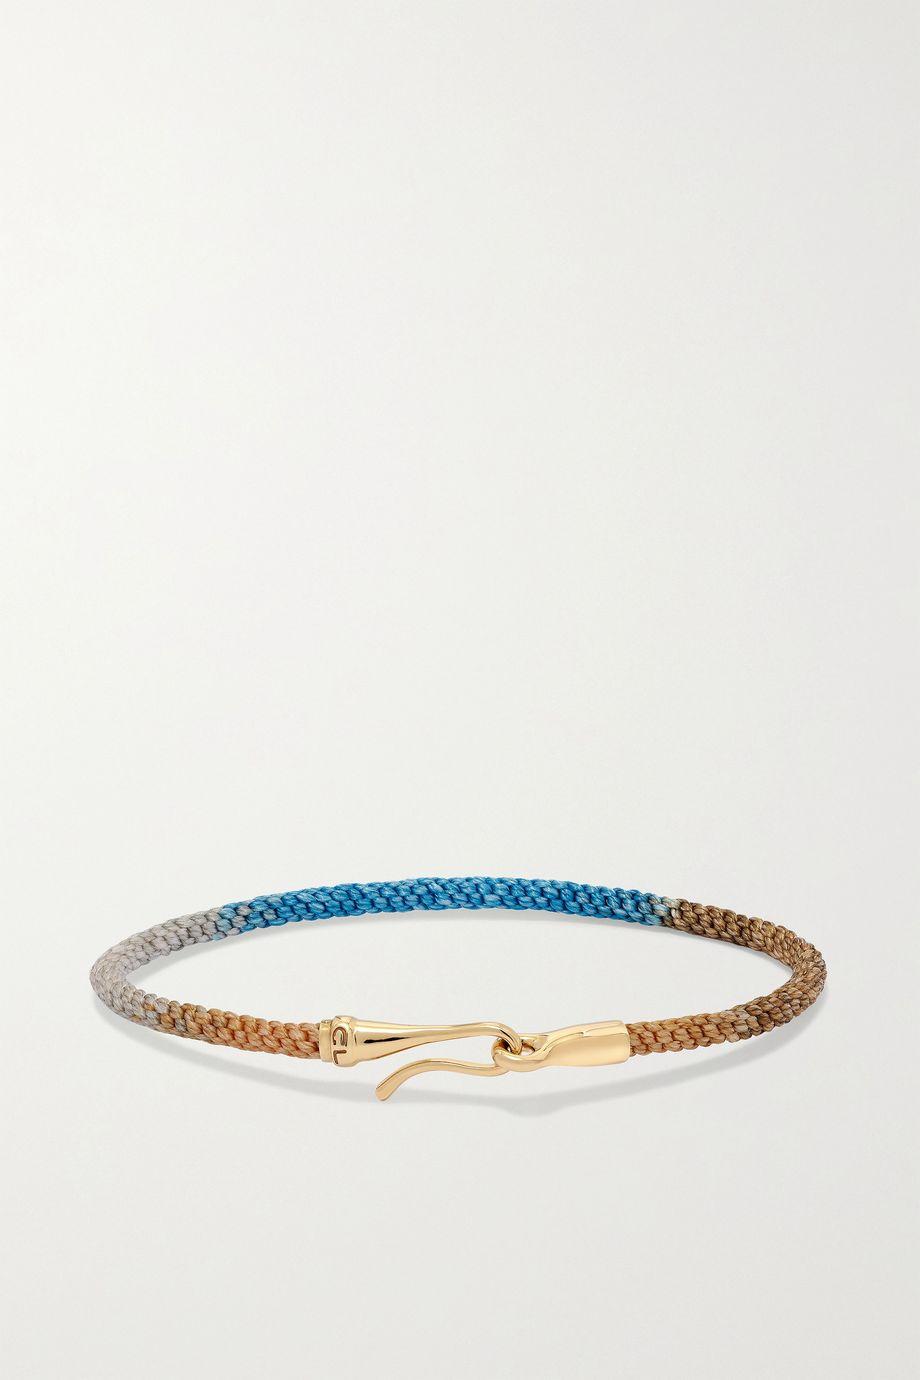 OLE LYNGGAARD COPENHAGEN Life 18-karat gold and rope bracelet